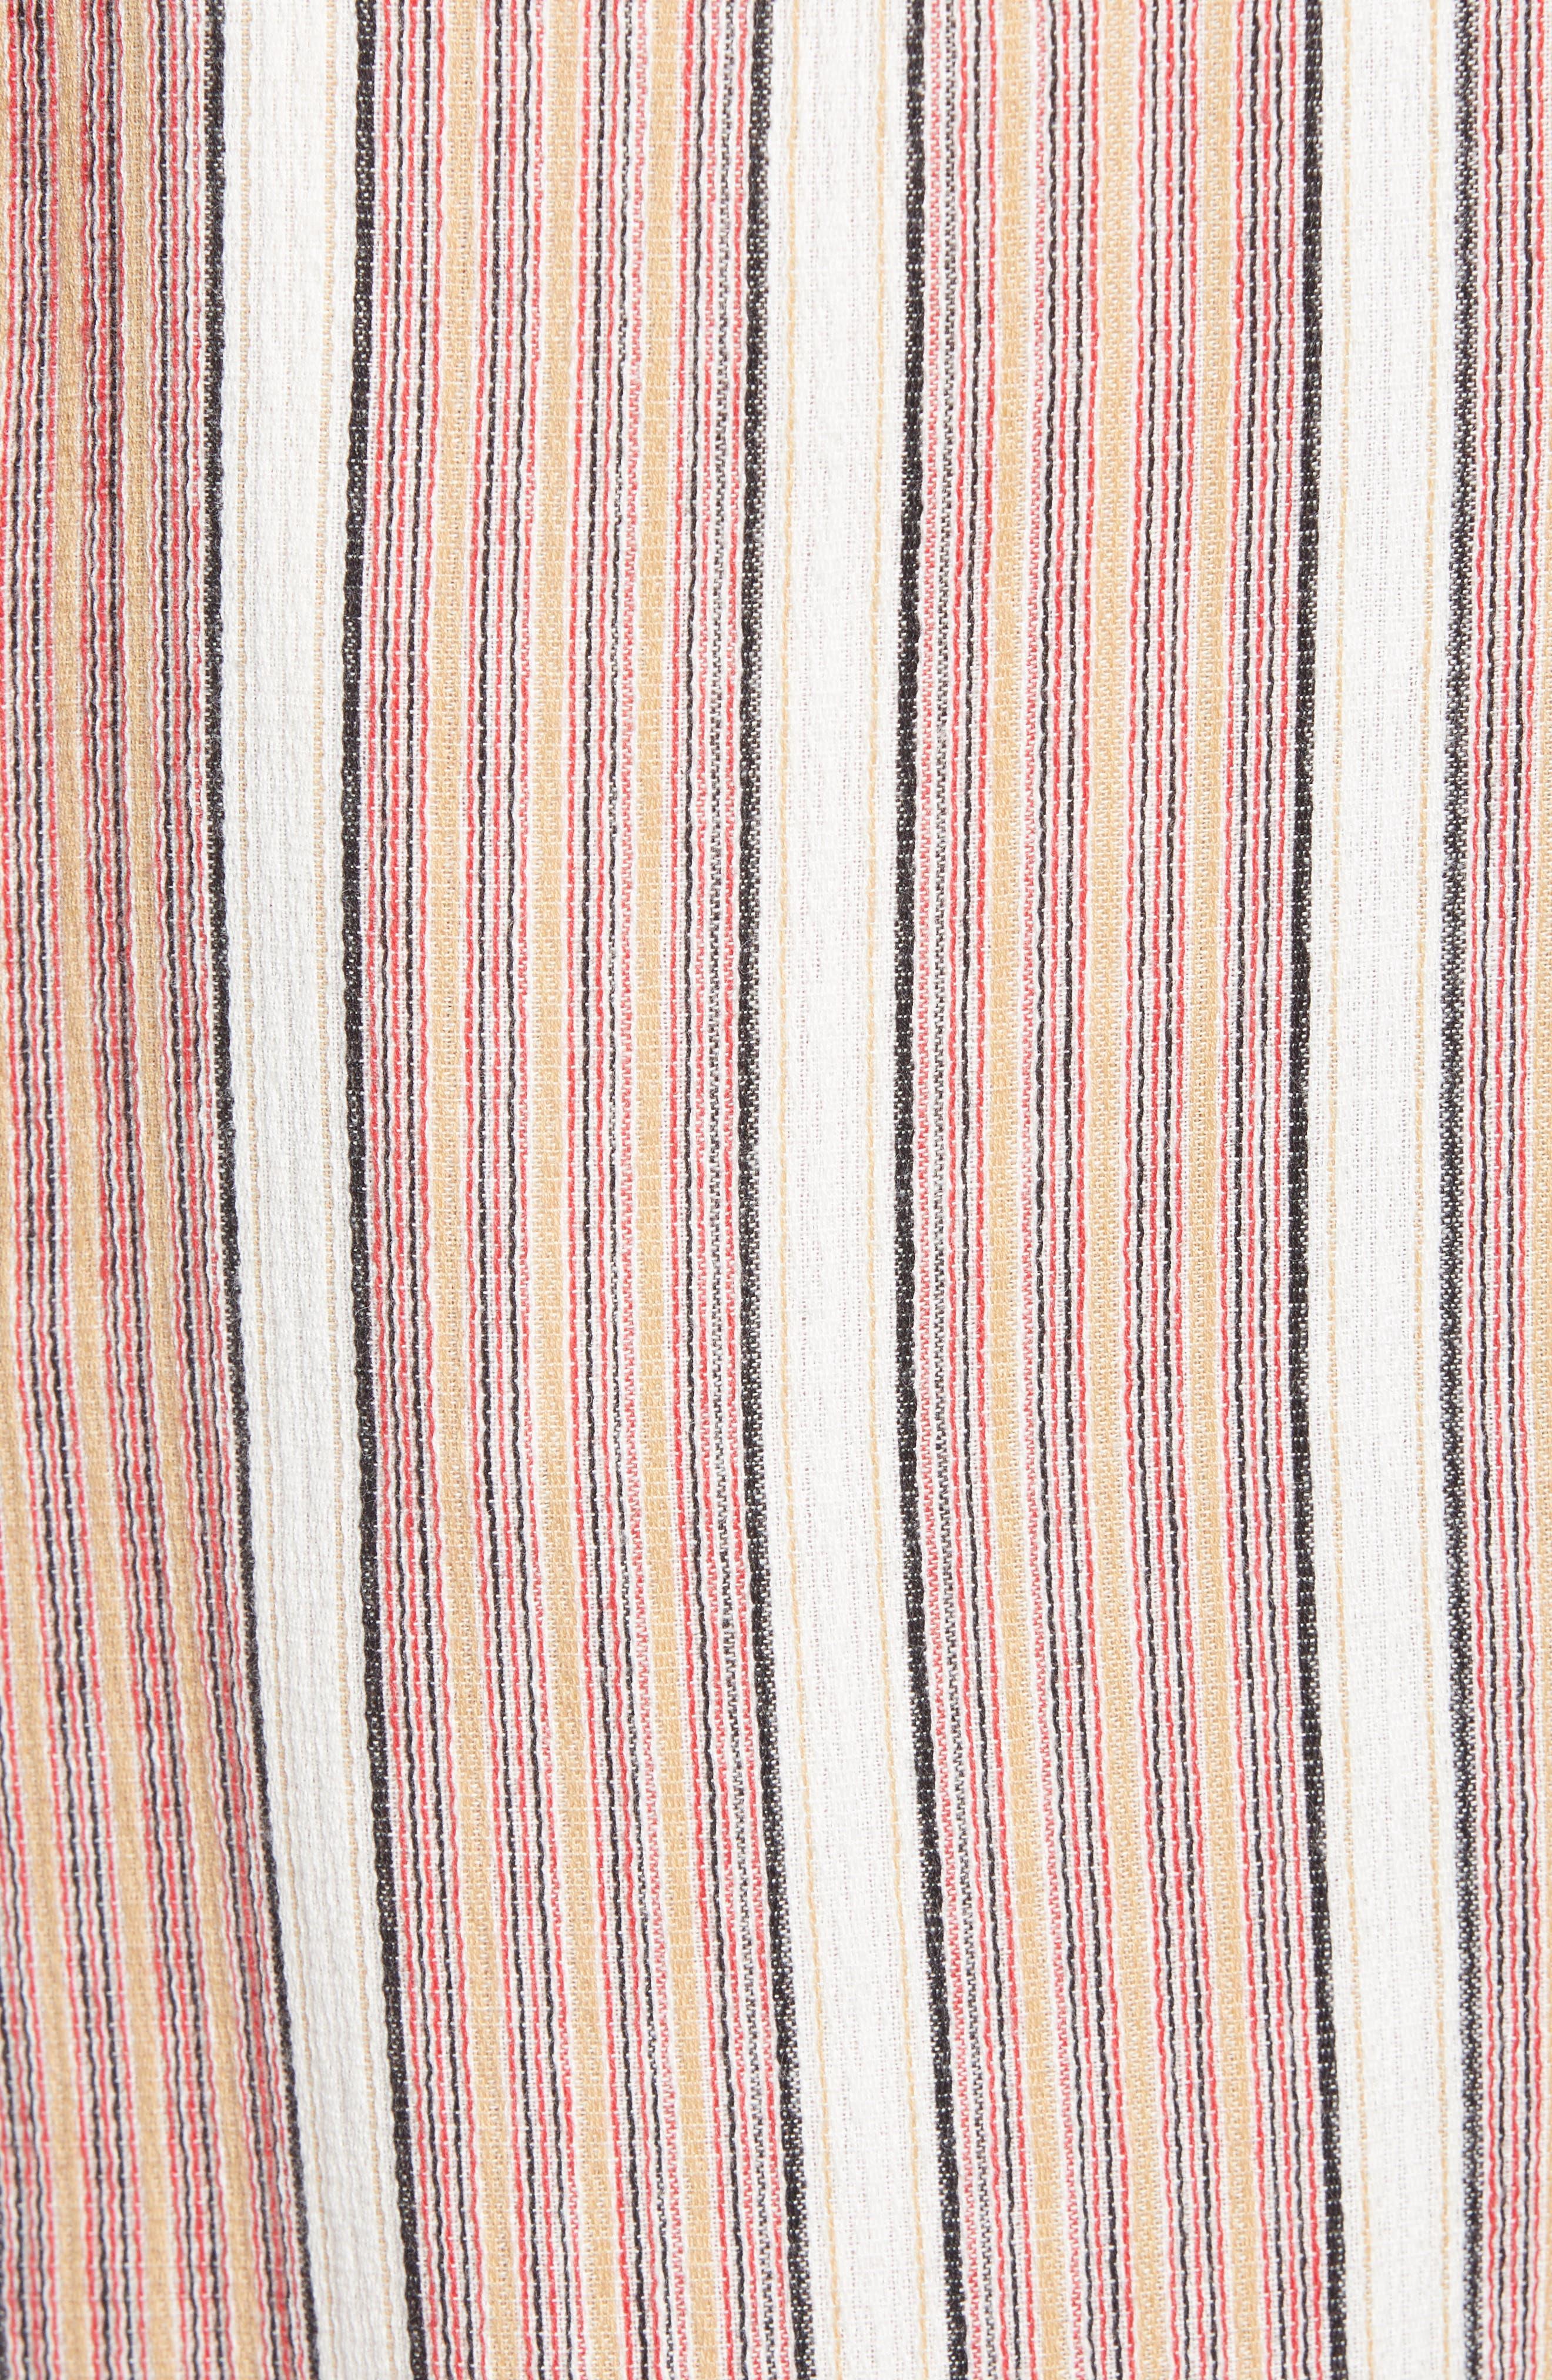 Midnight Avenue Stripe Pants,                             Alternate thumbnail 6, color,                             AMERICAN BEAUTY MULTI STRIPES